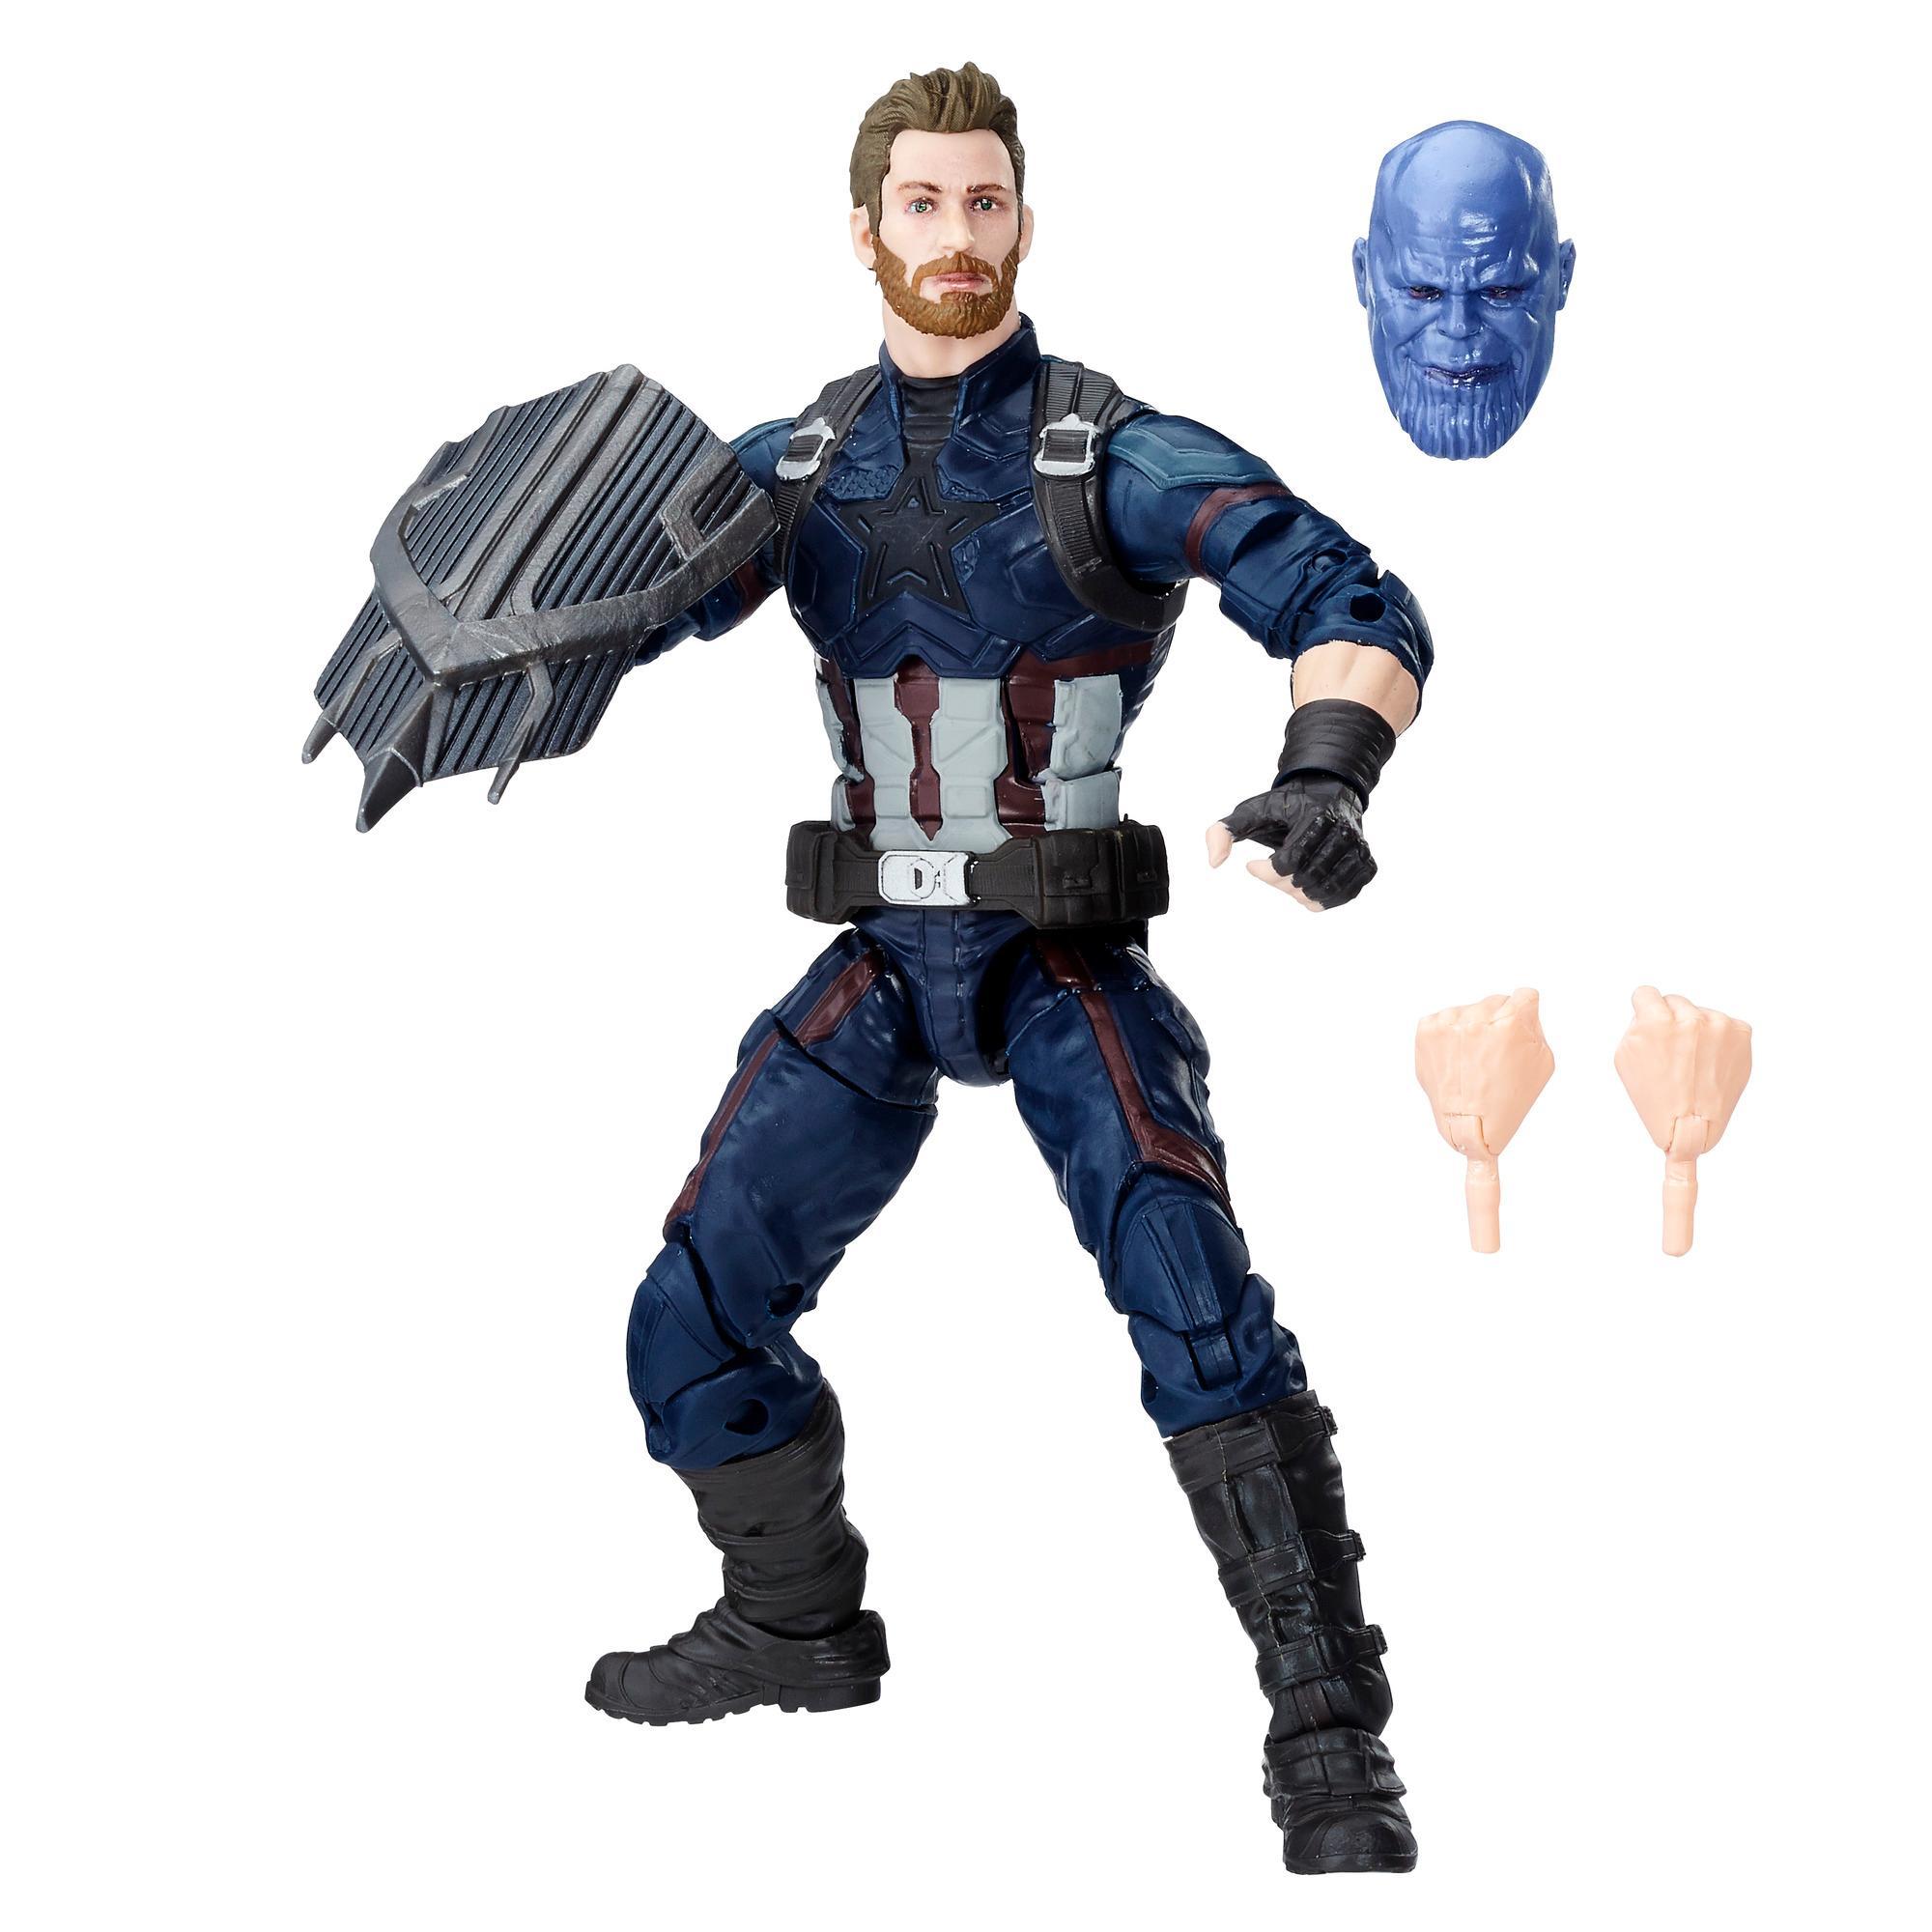 Avengers Marvel Legends Series - Captain America de 15 cm